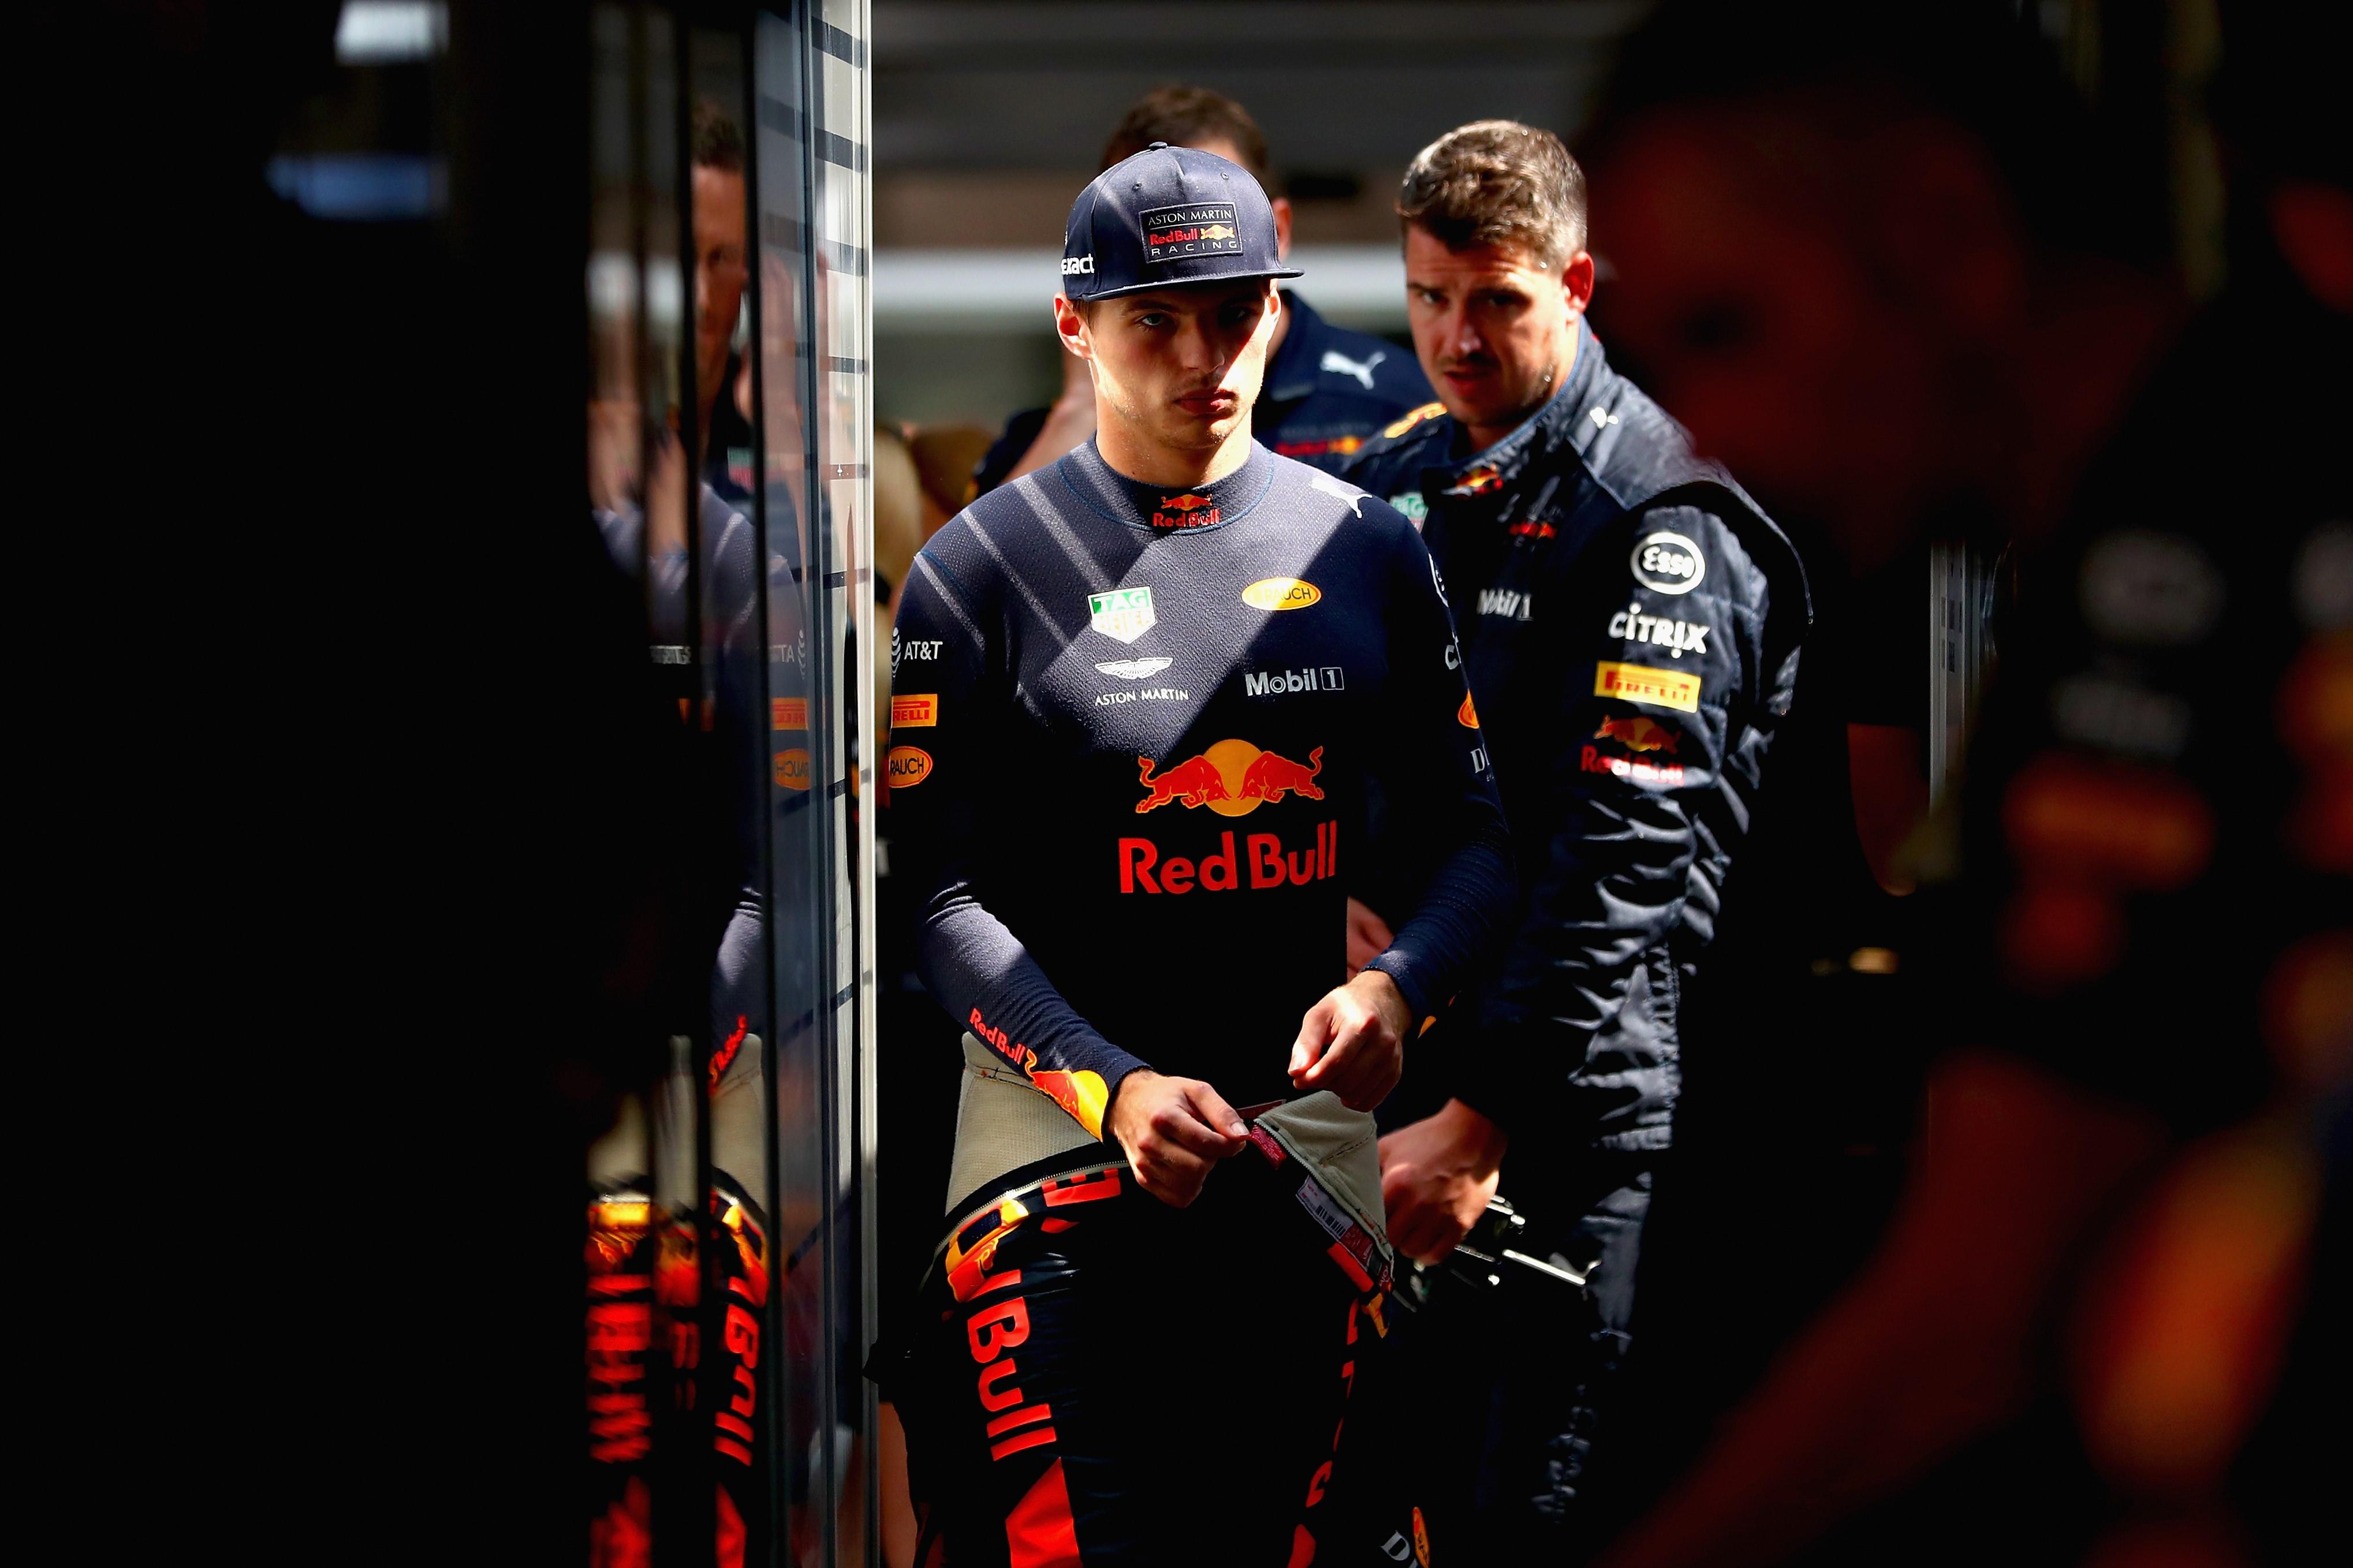 Max Verstappen (Red Bull) au Grand Prix de Hongrie 2018